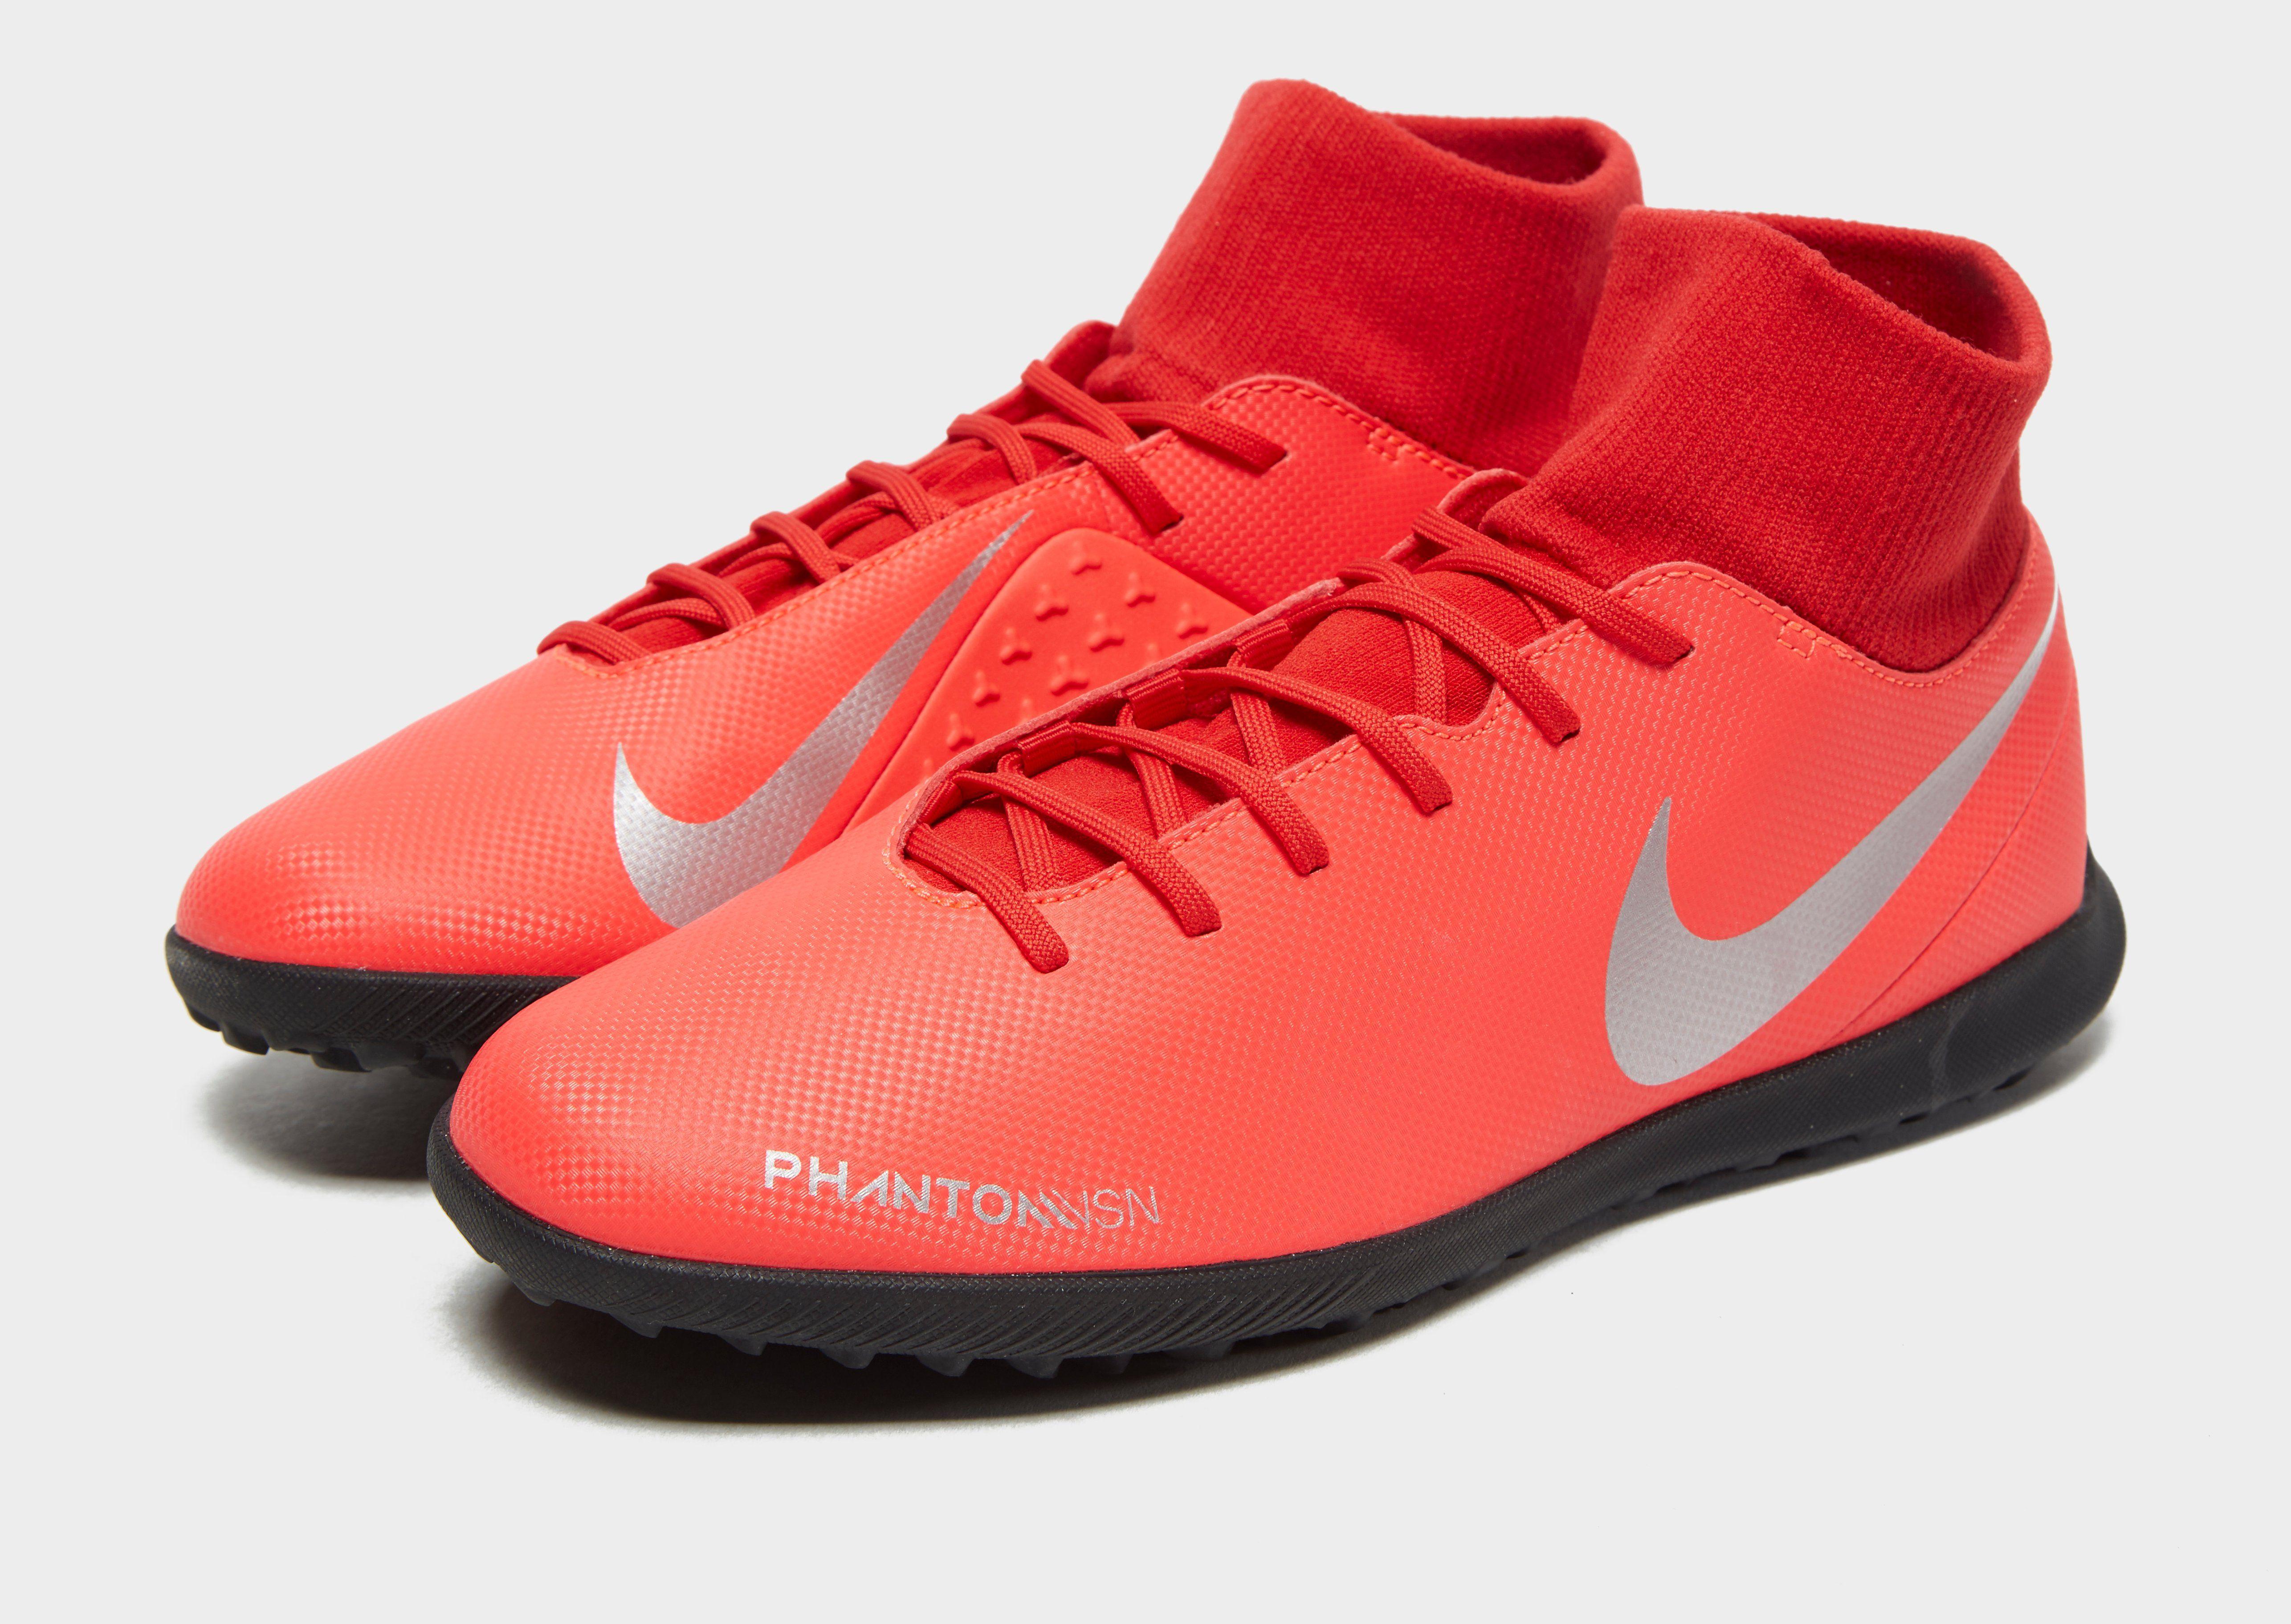 Nike Game Over Phantom Vision Club TF